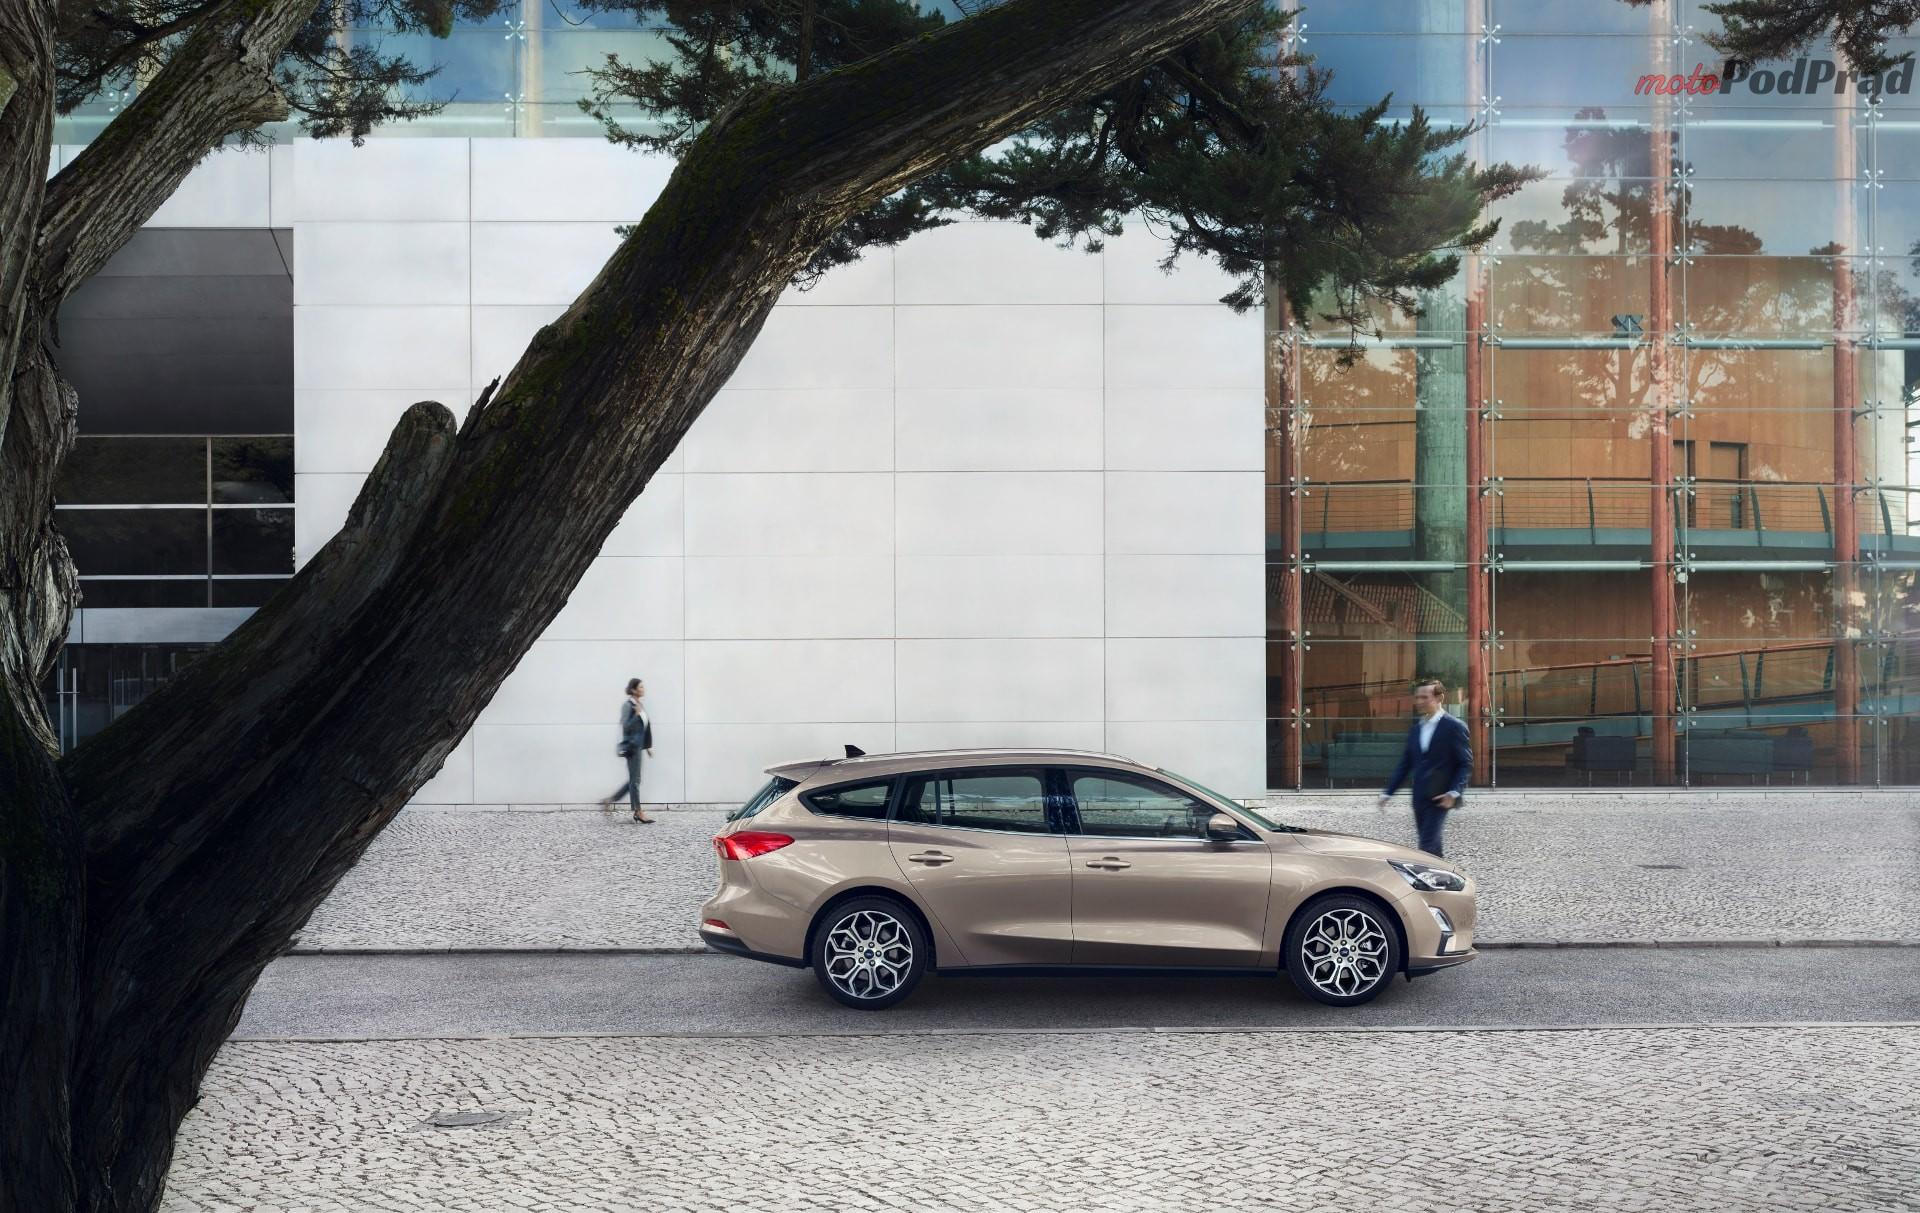 FORD 2018 FOCUS TITANIUM  01 min Po 8 latach Ford prezentuje nowego Focusa